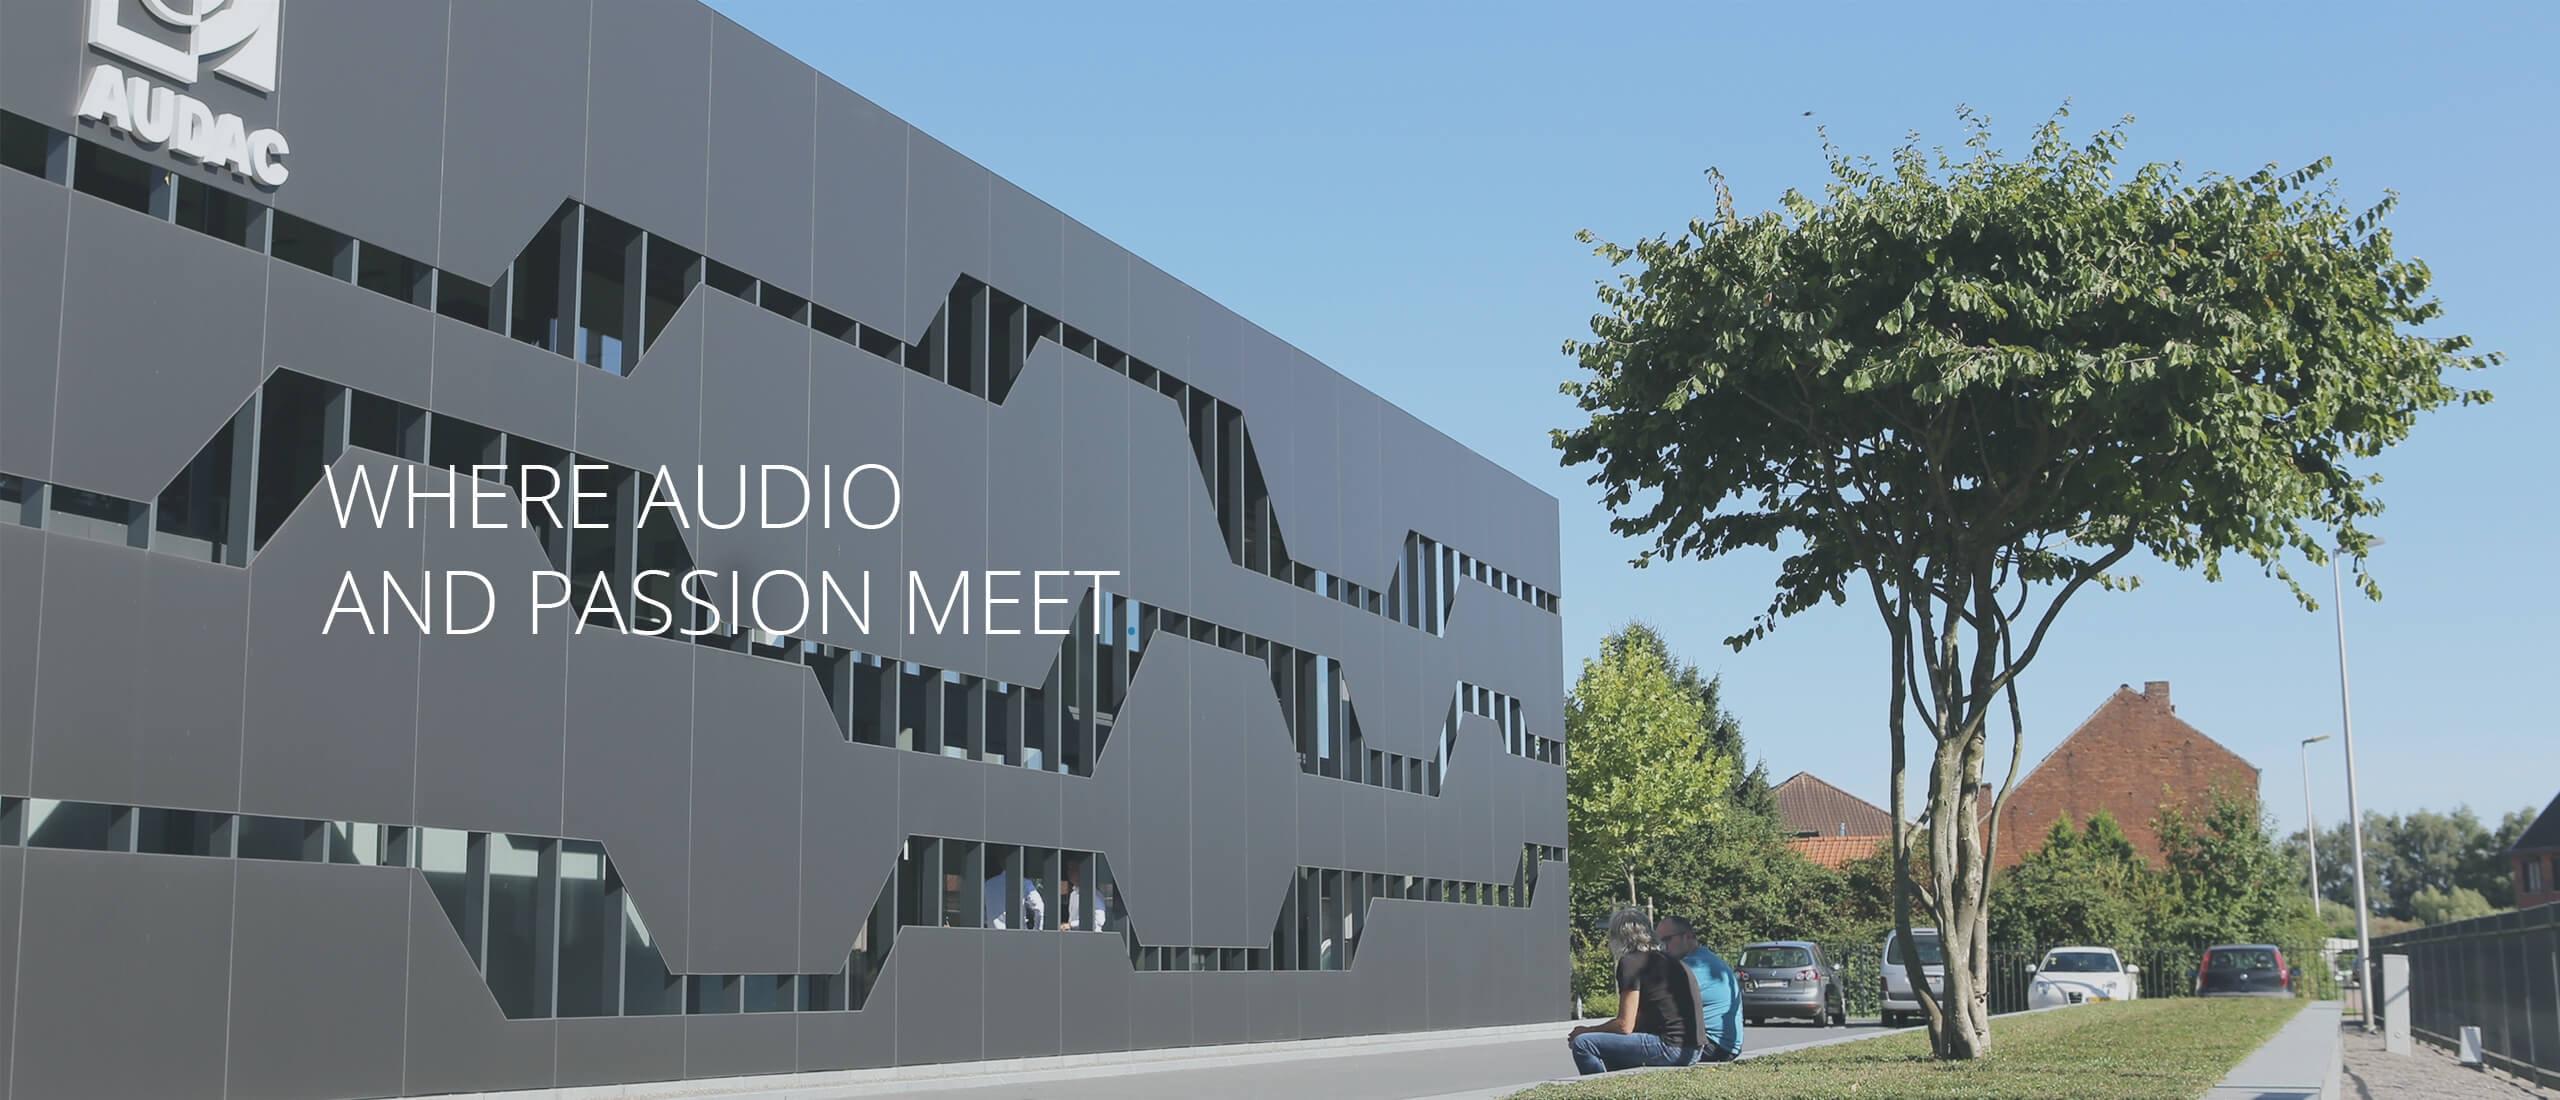 AUDAC Experience Center